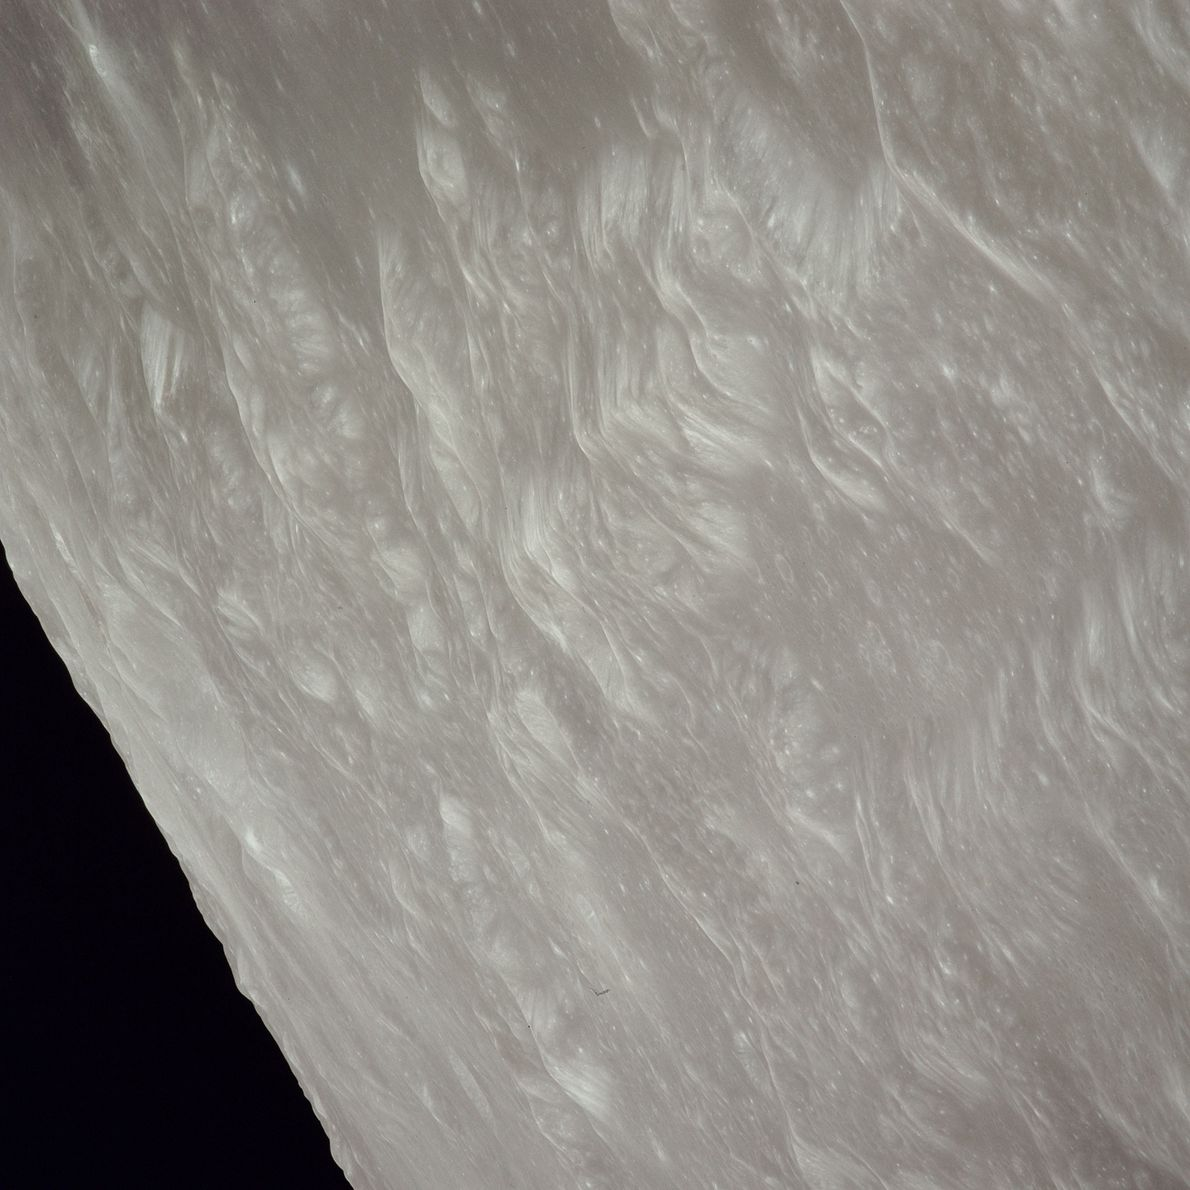 La superficie de la Luna.